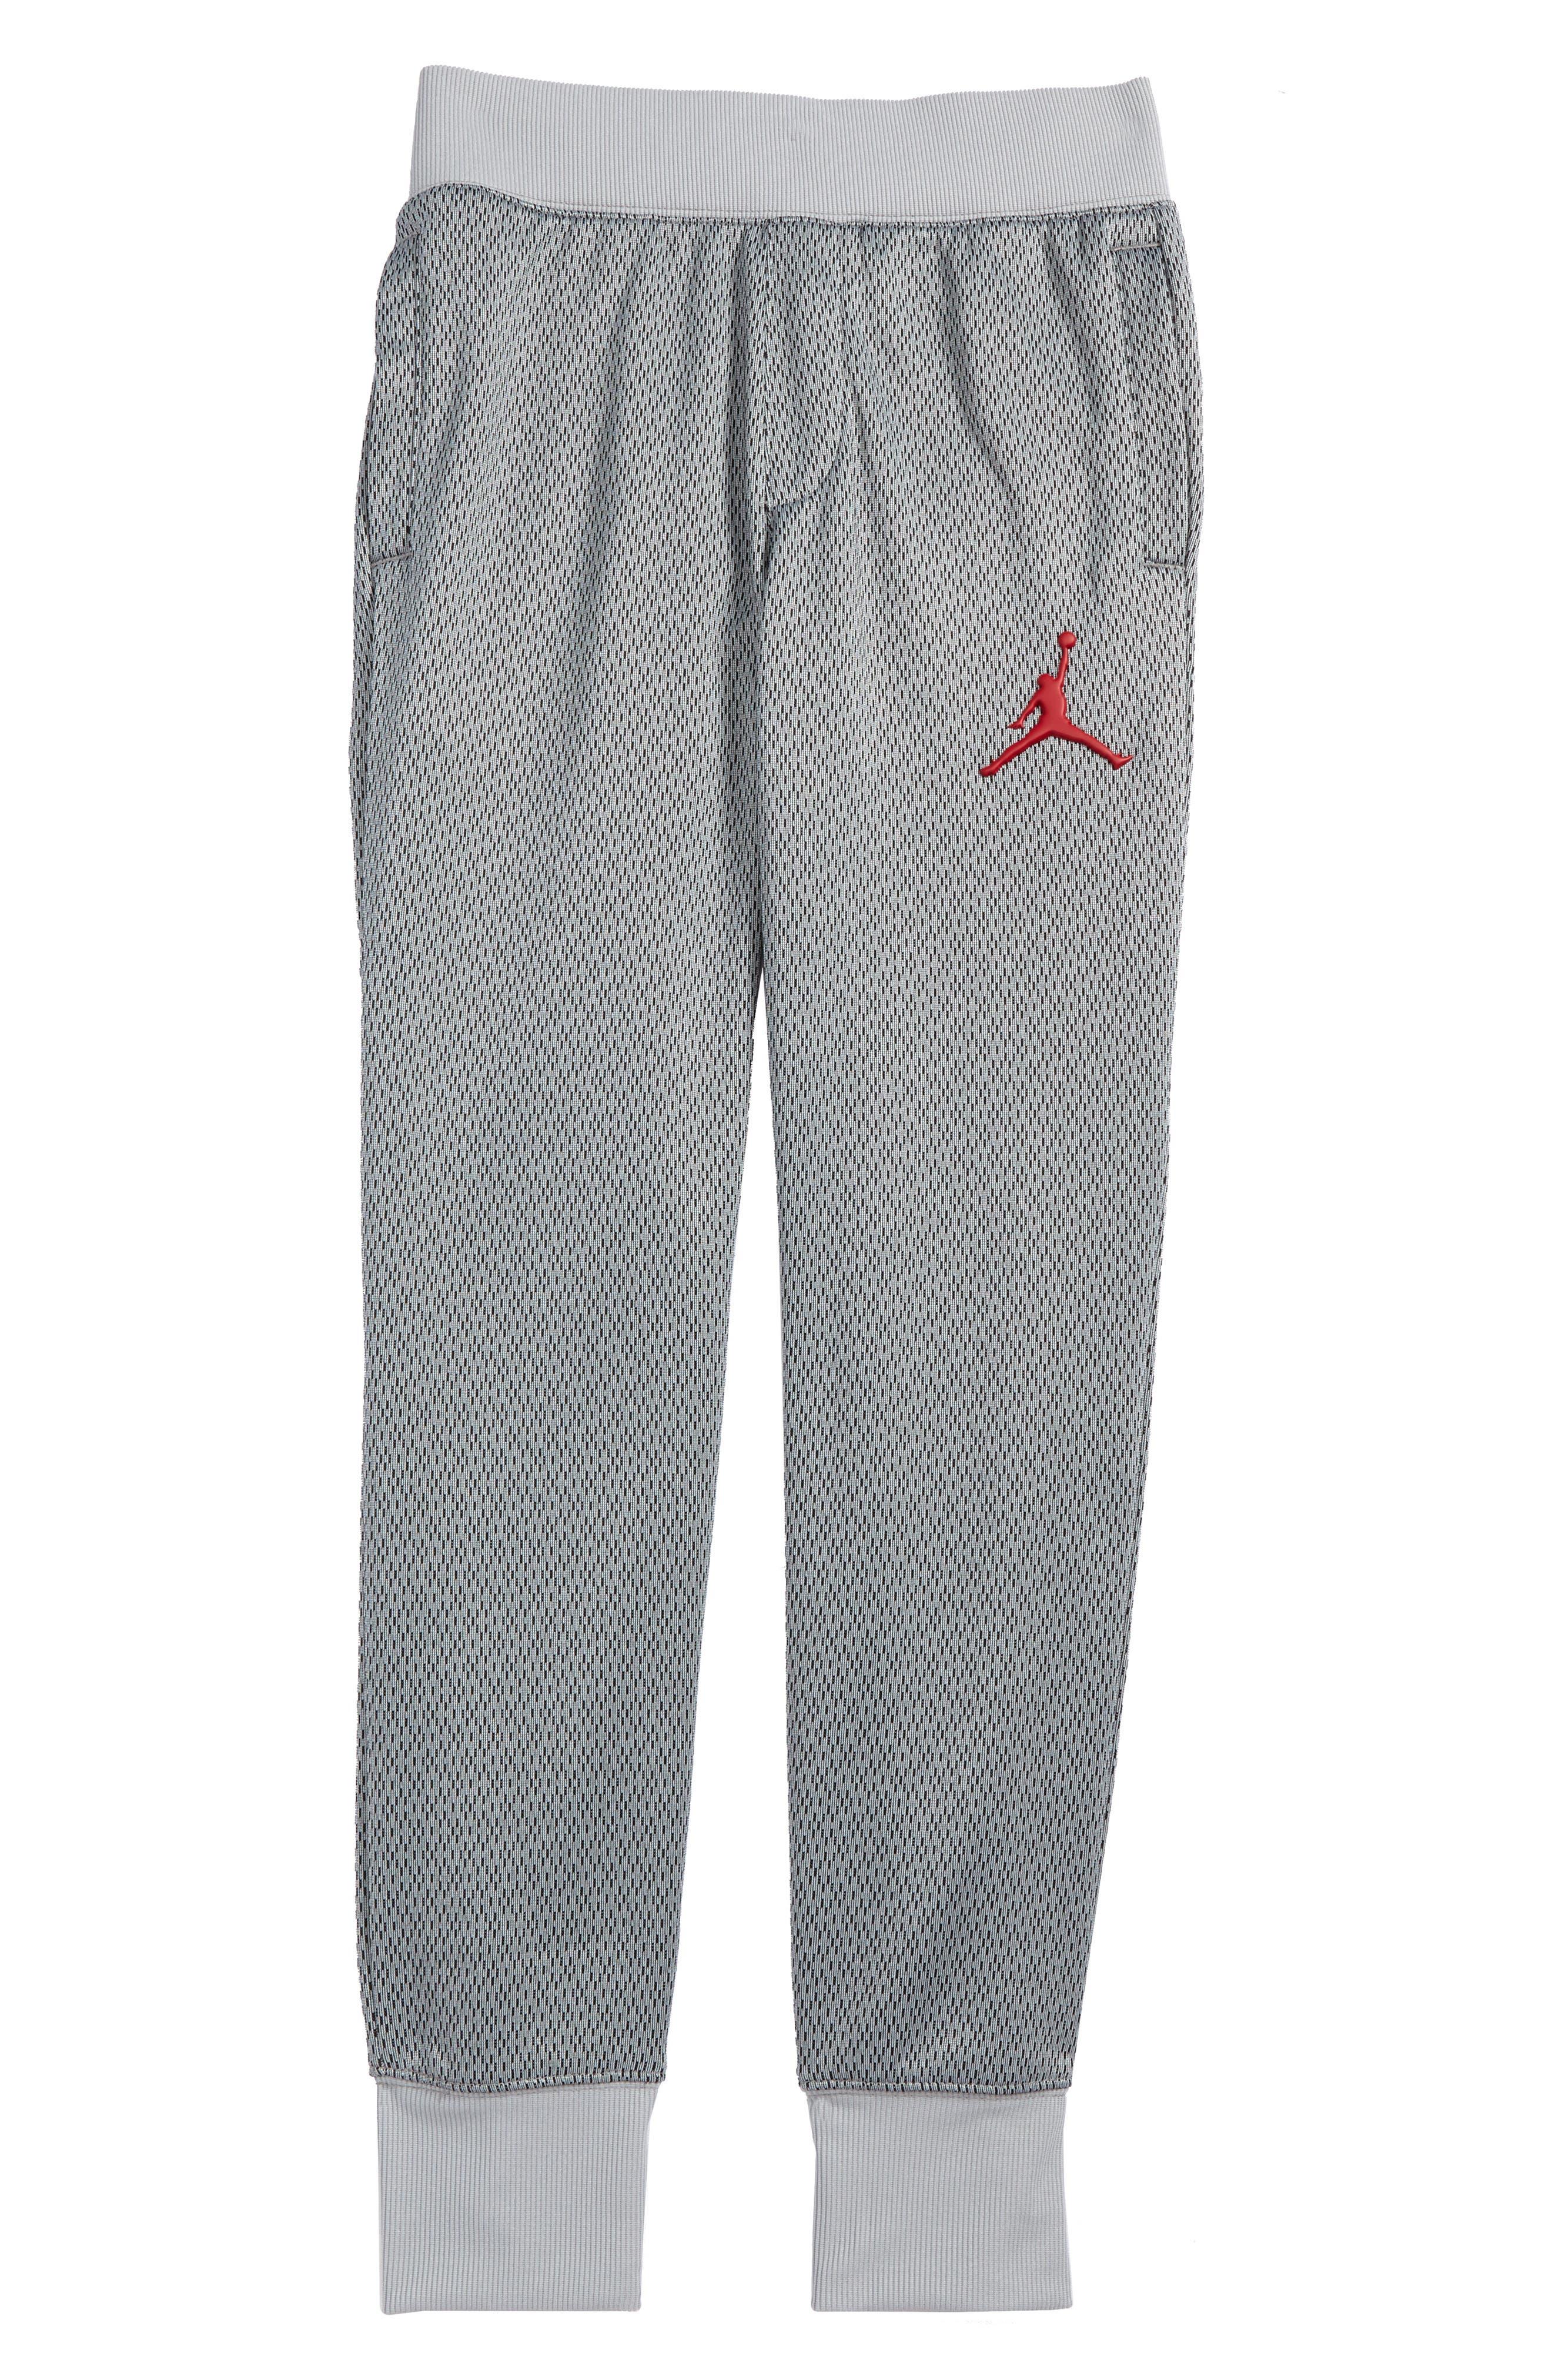 Jordan AJ Techno Print Jogger Pants (Big Boys)